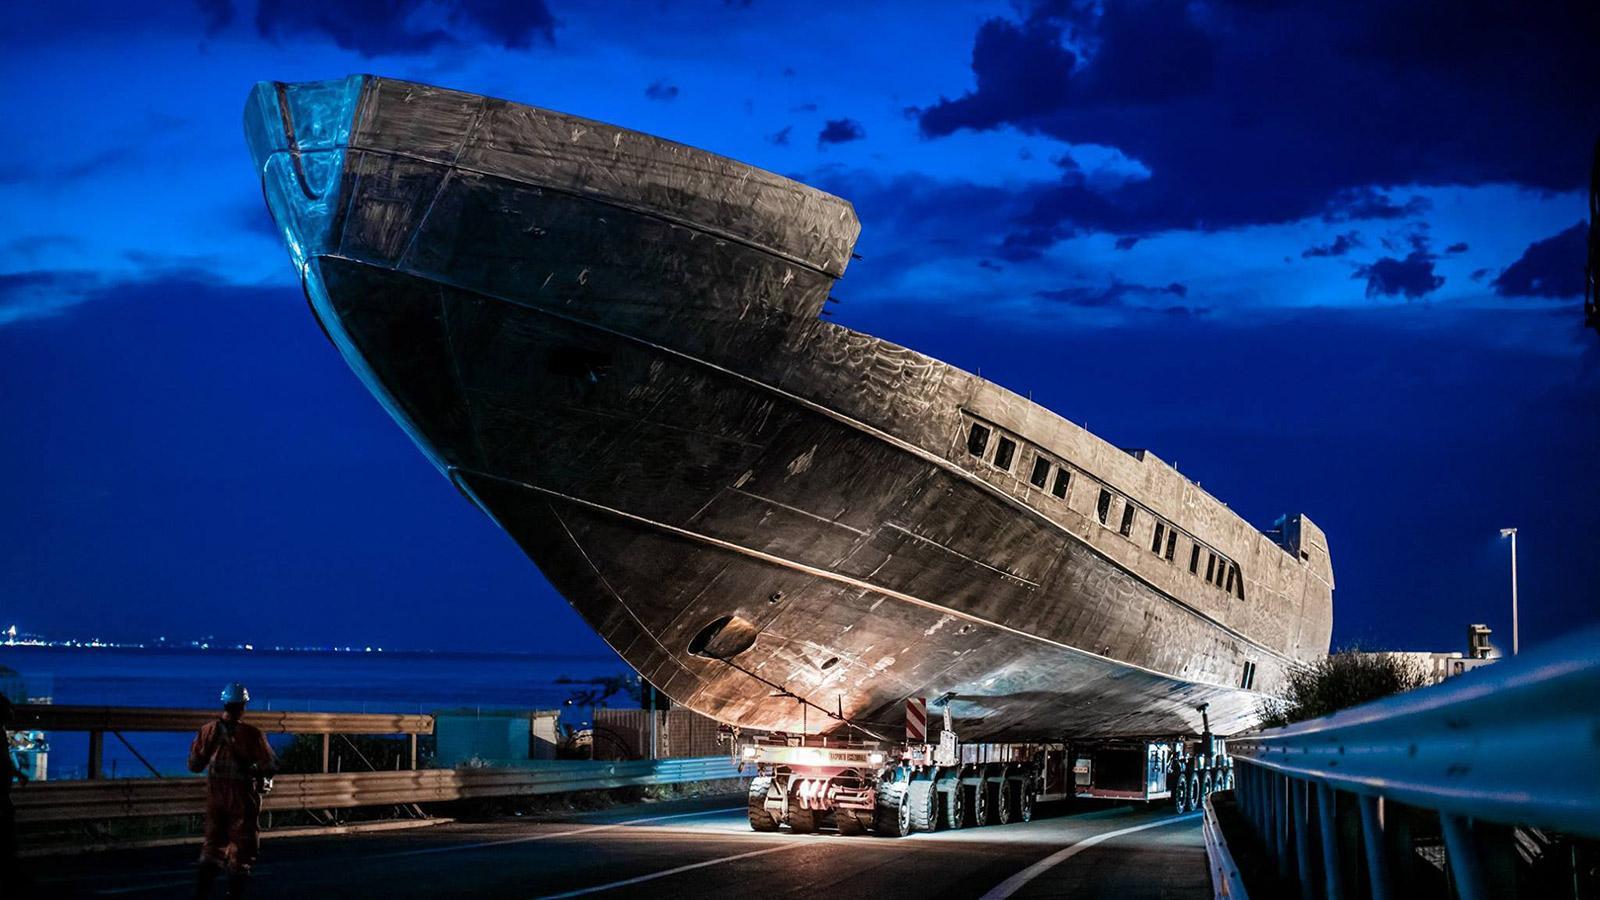 pershing 140 motoryacht pershing yachts 43m 2018 under construction hull half profile